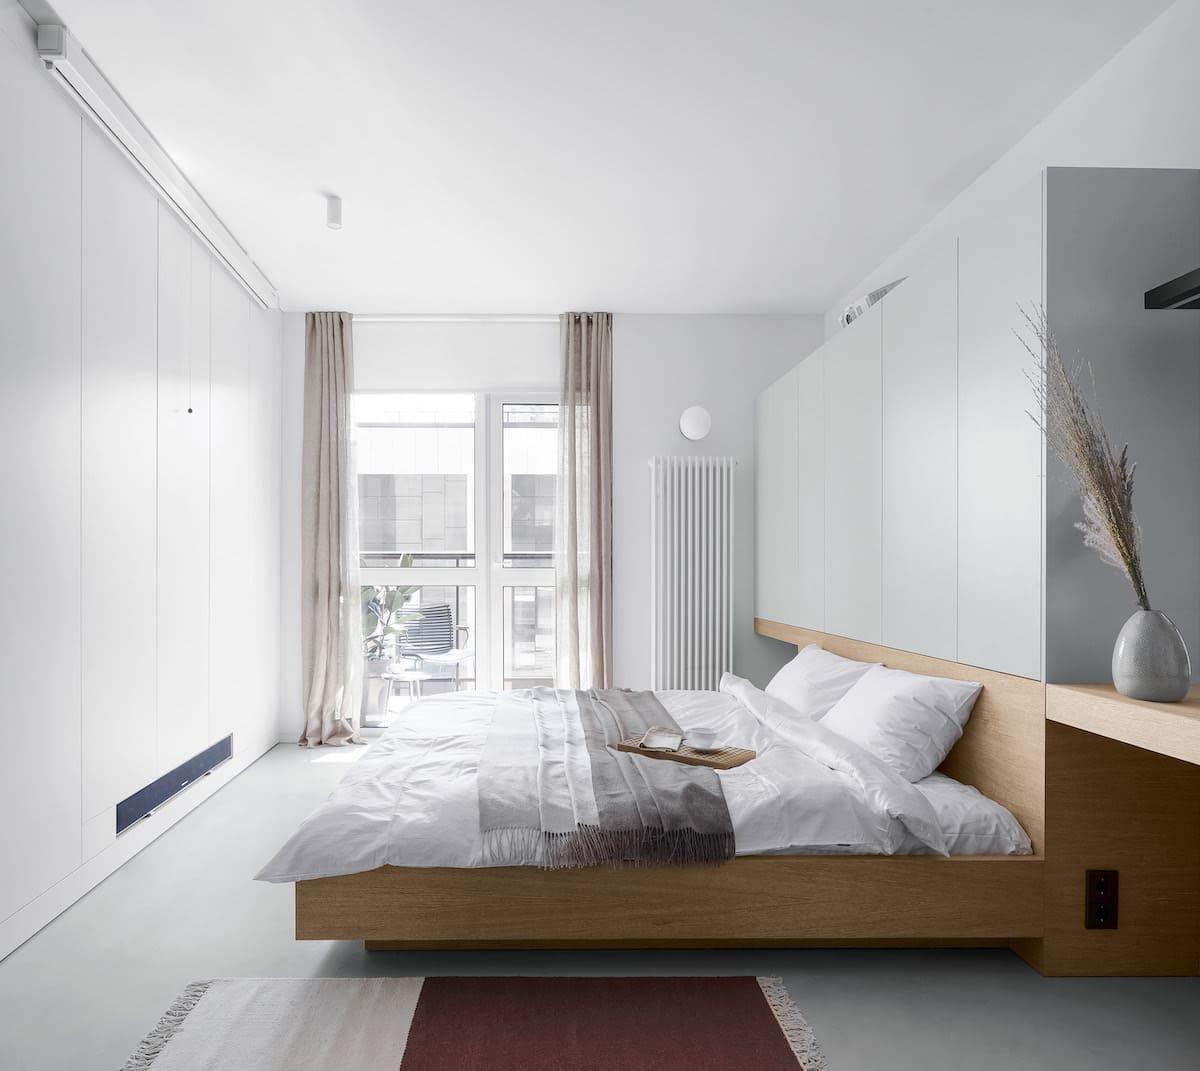 интерьер спальни фото 55